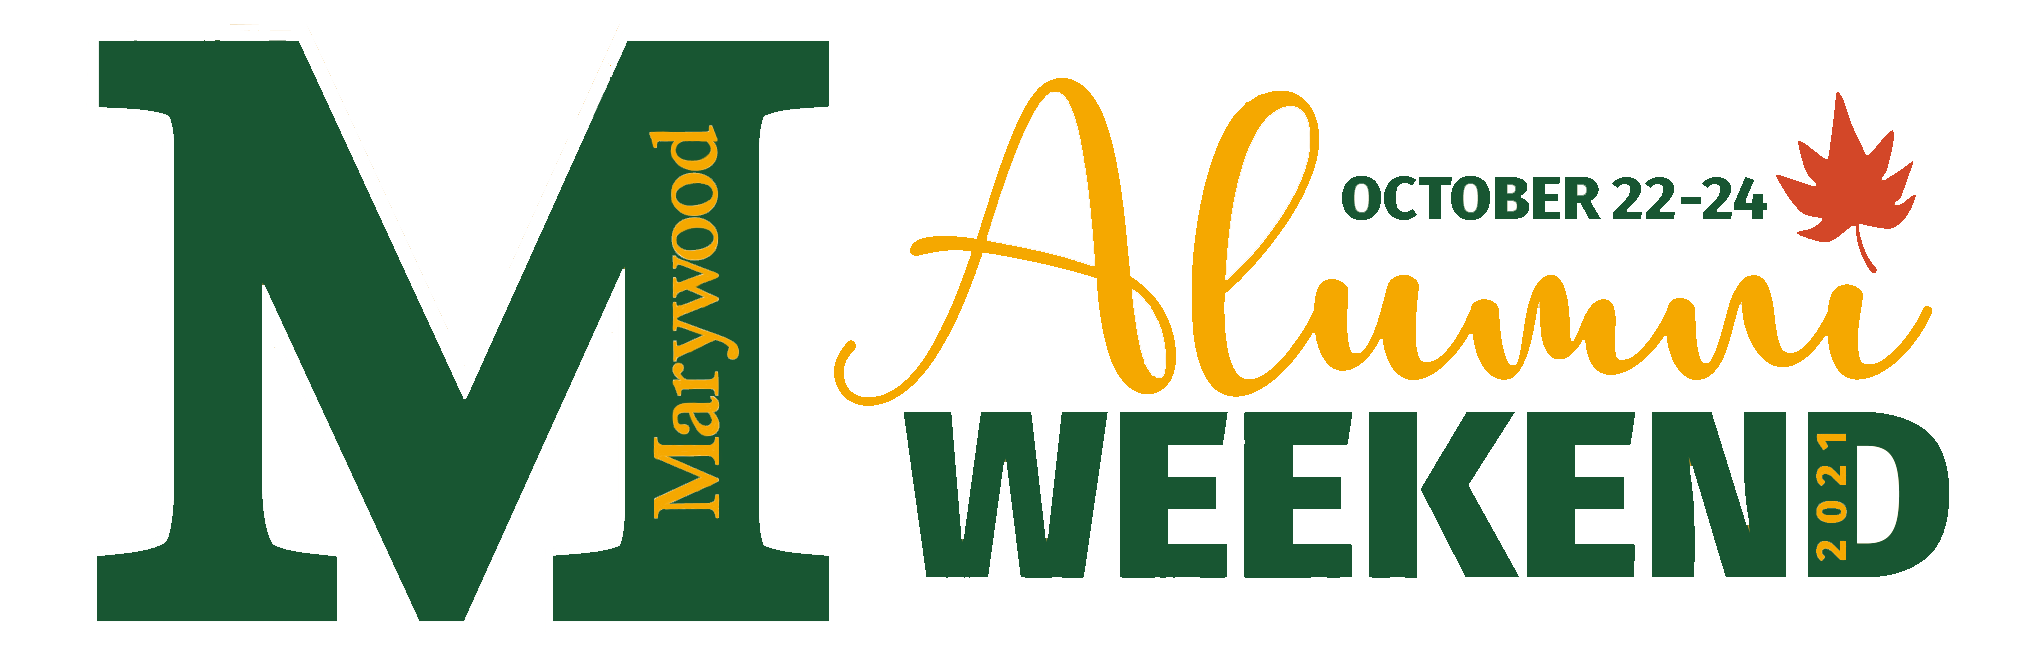 Alumni Weekend 2021 logo